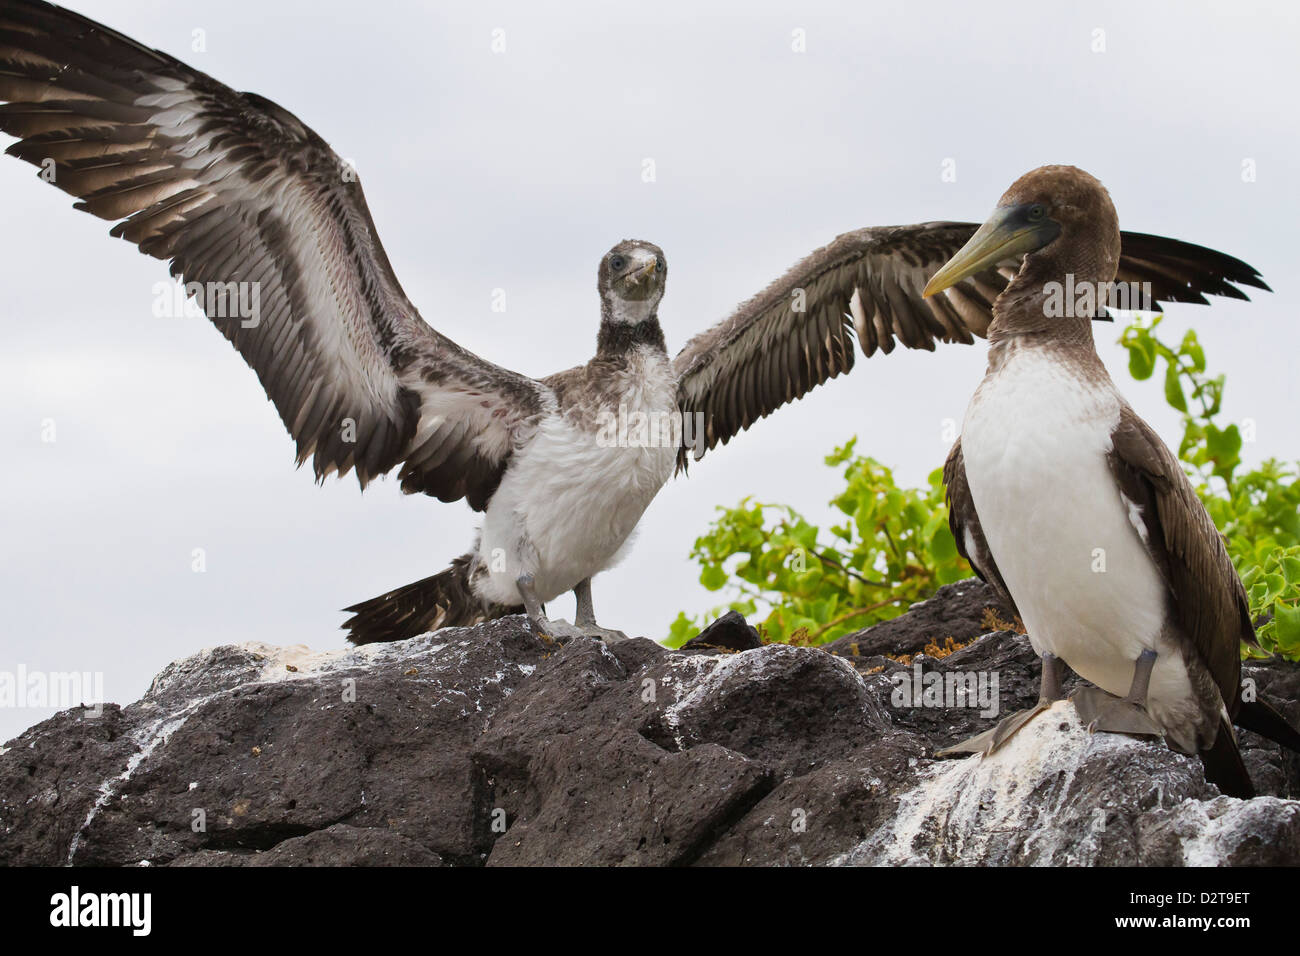 Nazca booby (Sula grantii) chick, Punta Suarez, Santiago Island, Galapagos Islands, Ecuador, South America - Stock Image